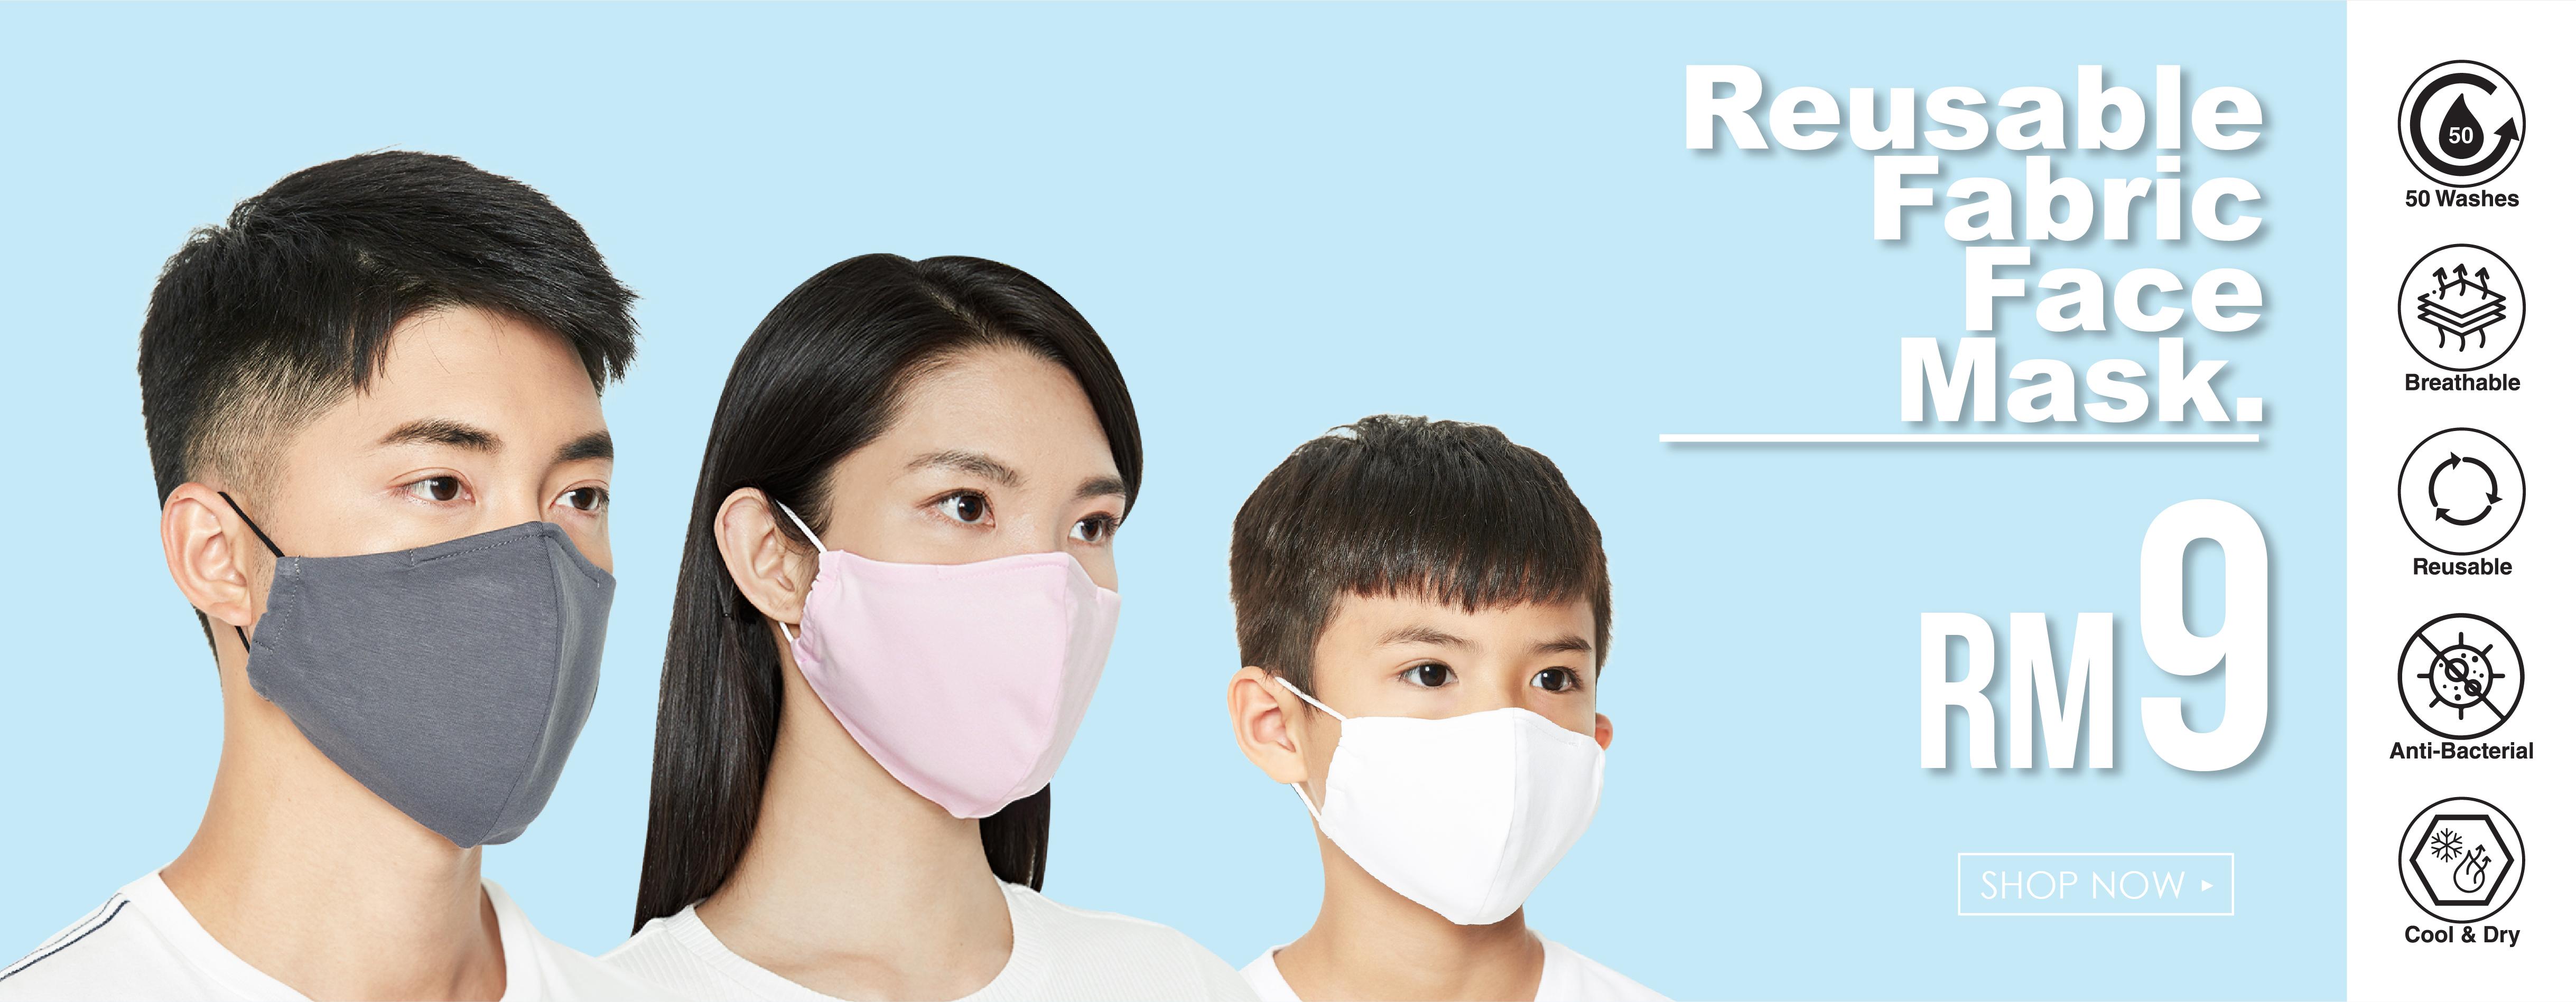 PDI Face Mask